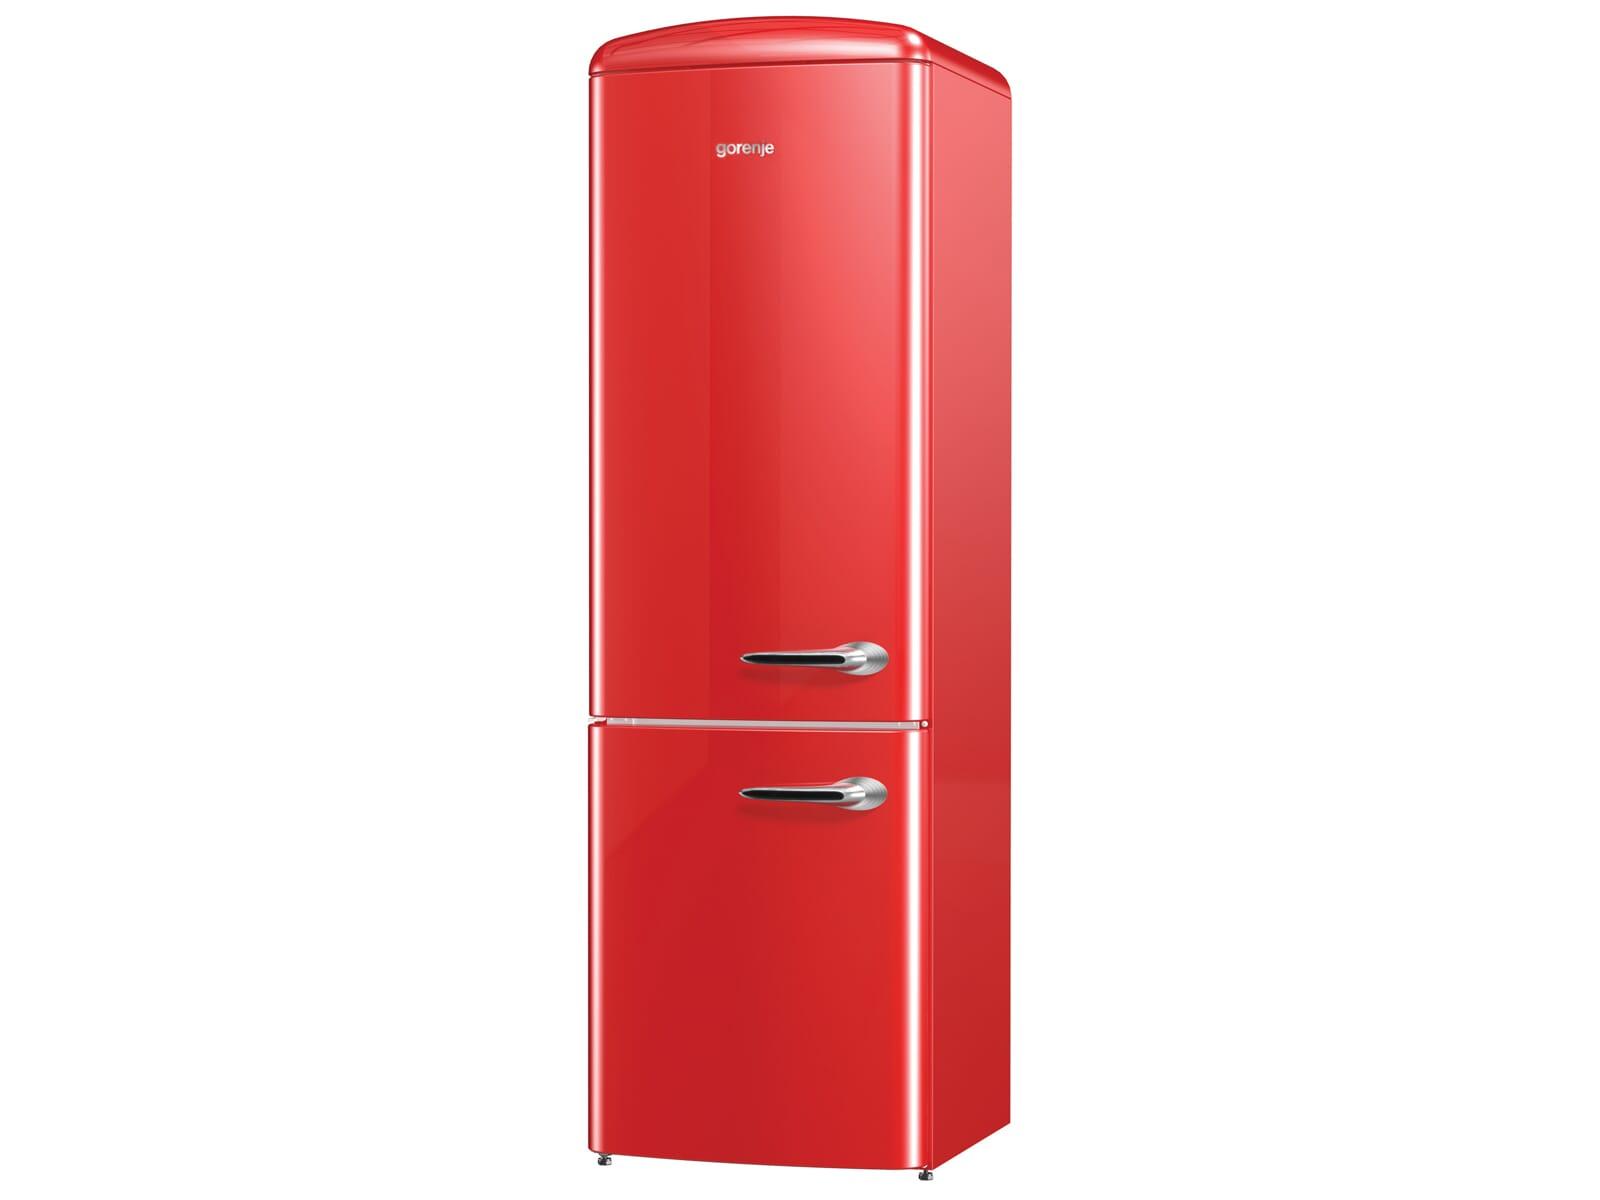 Gorenje Kühlschrank Kombi : Gorenje kühlschrank gefrierkombination gorenje kühl